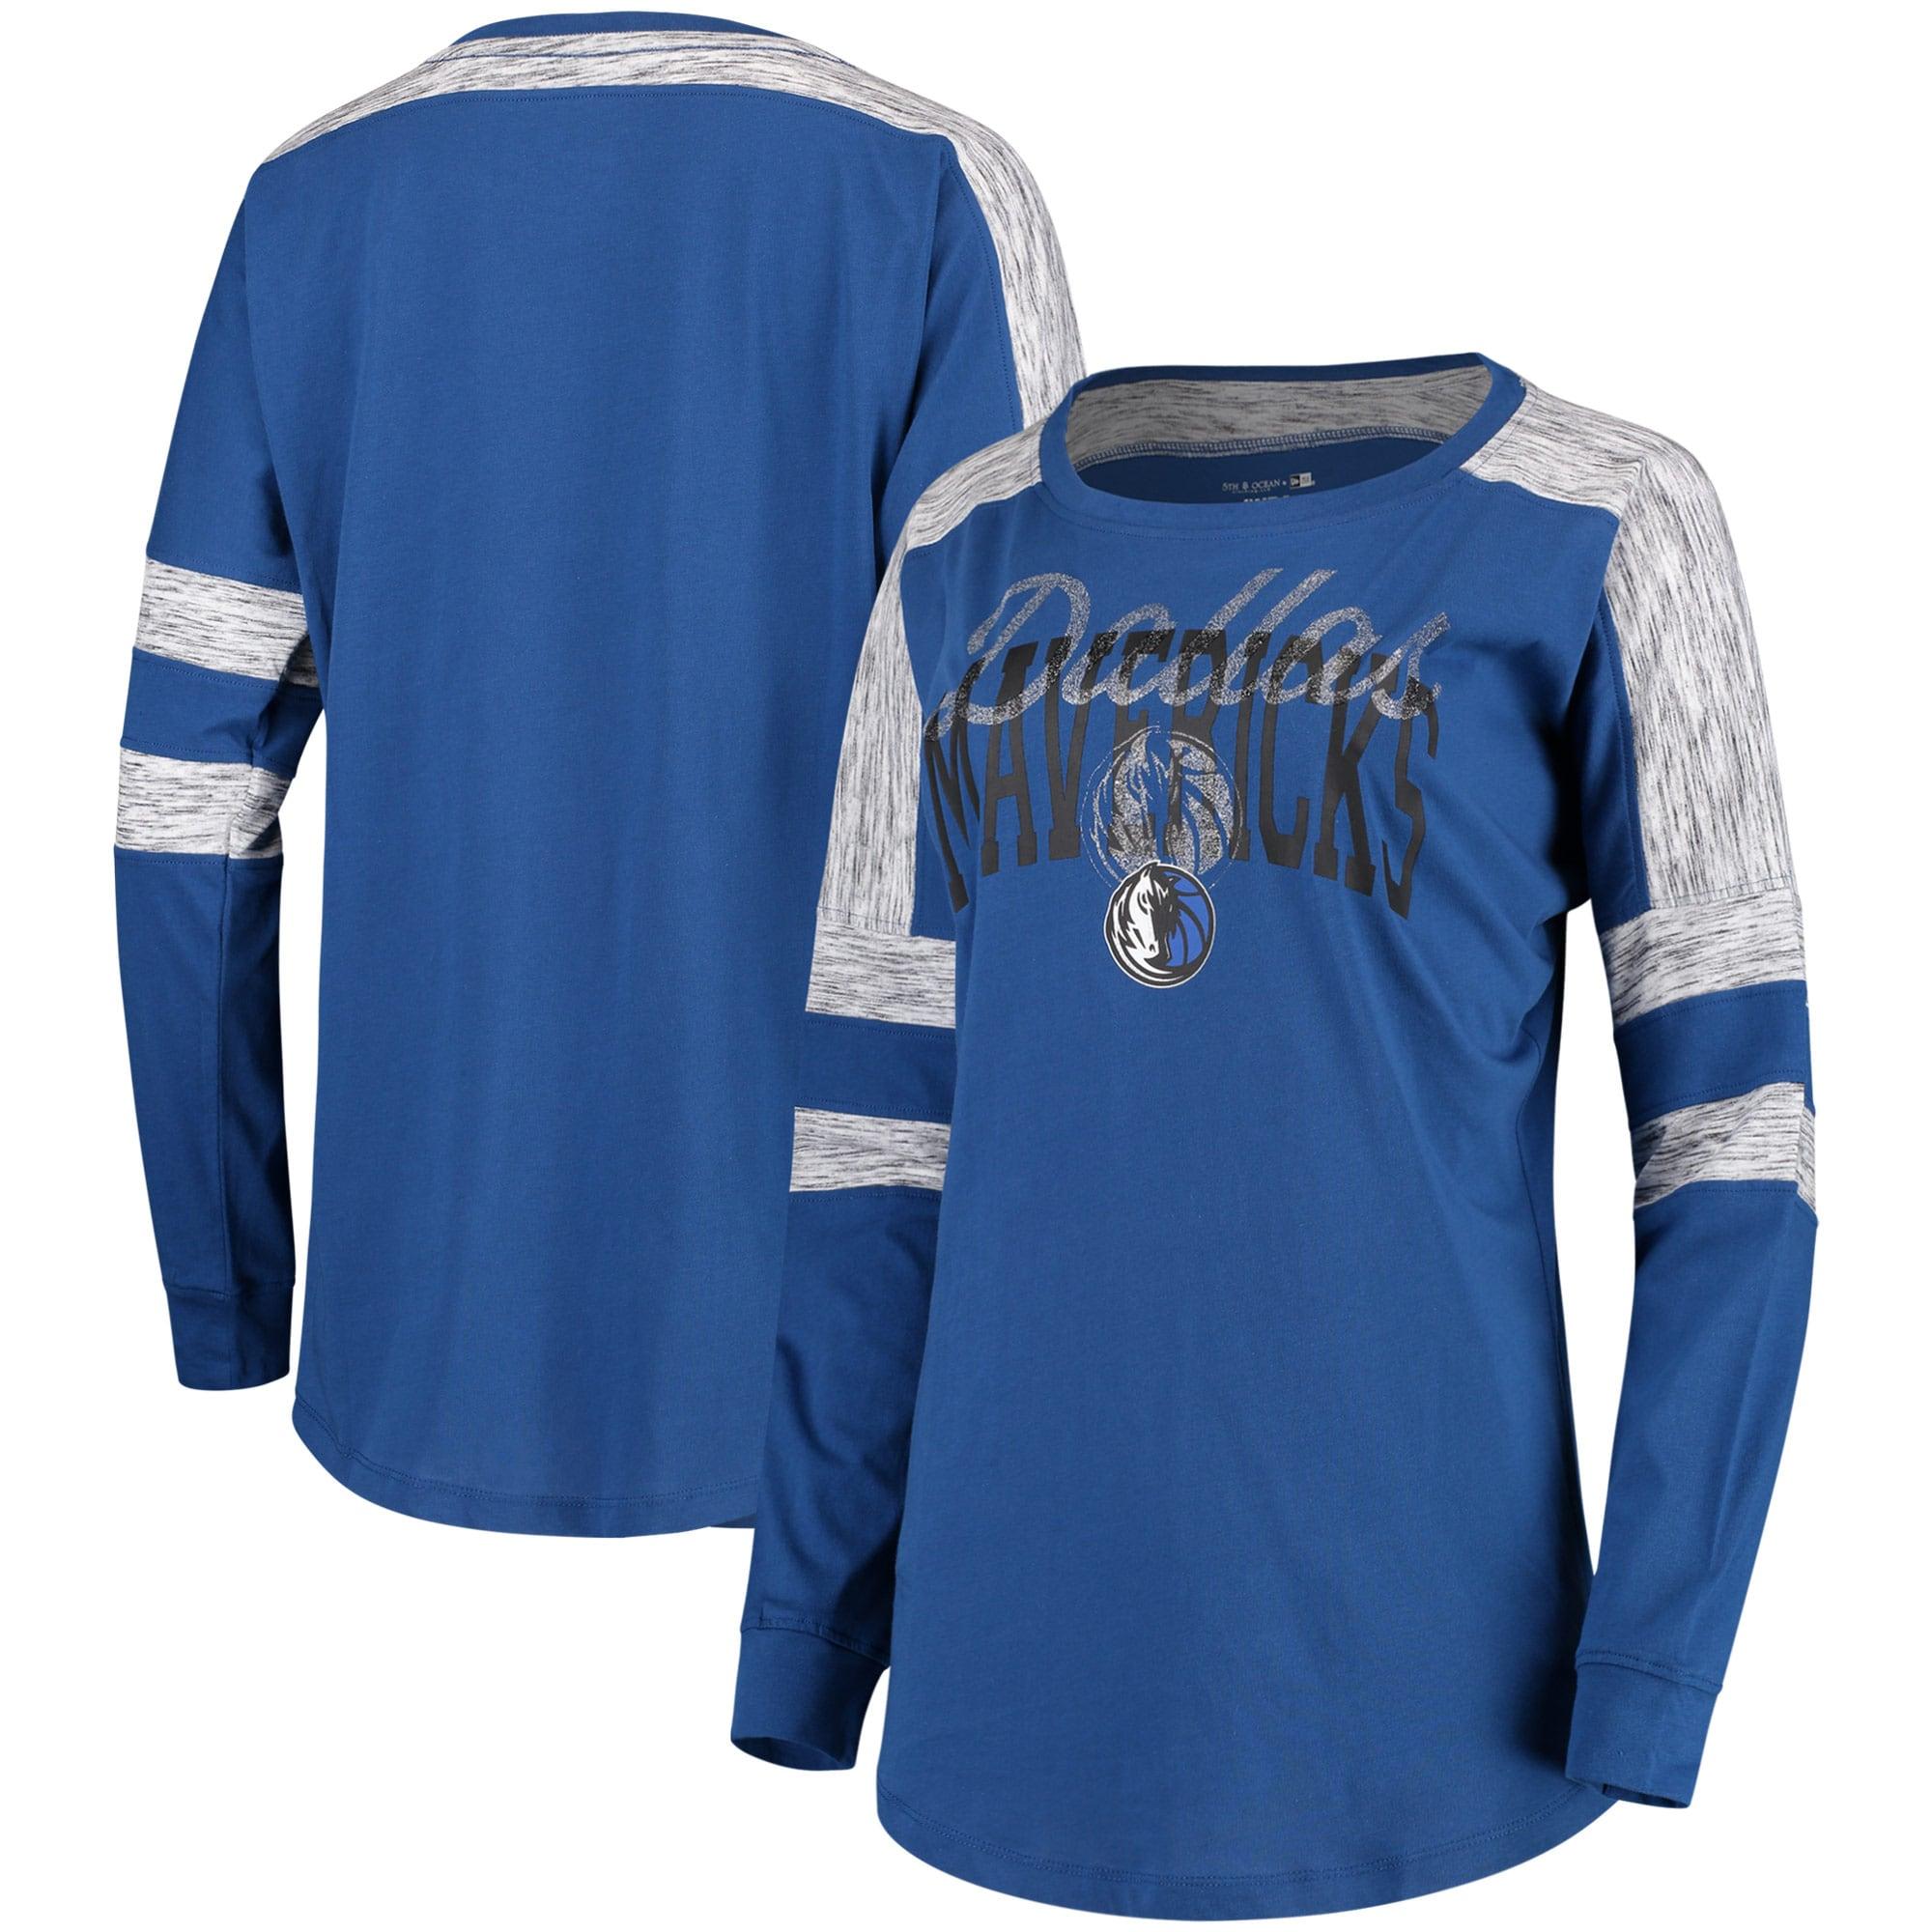 Dallas Mavericks 5th & Ocean by New Era Women's Space Dye Baby Jersey Long Sleeve T-Shirt - Blue